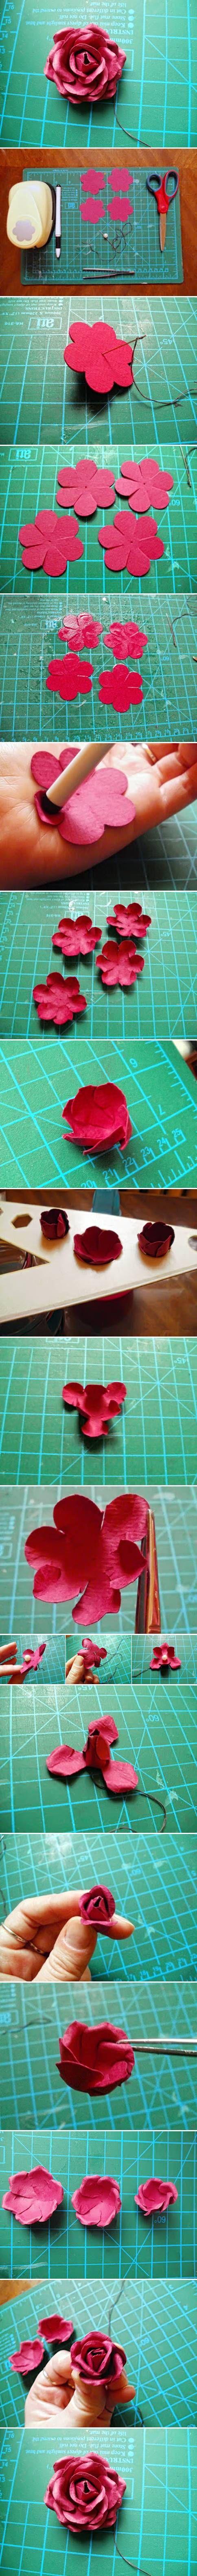 DIY Pink Paper Rose